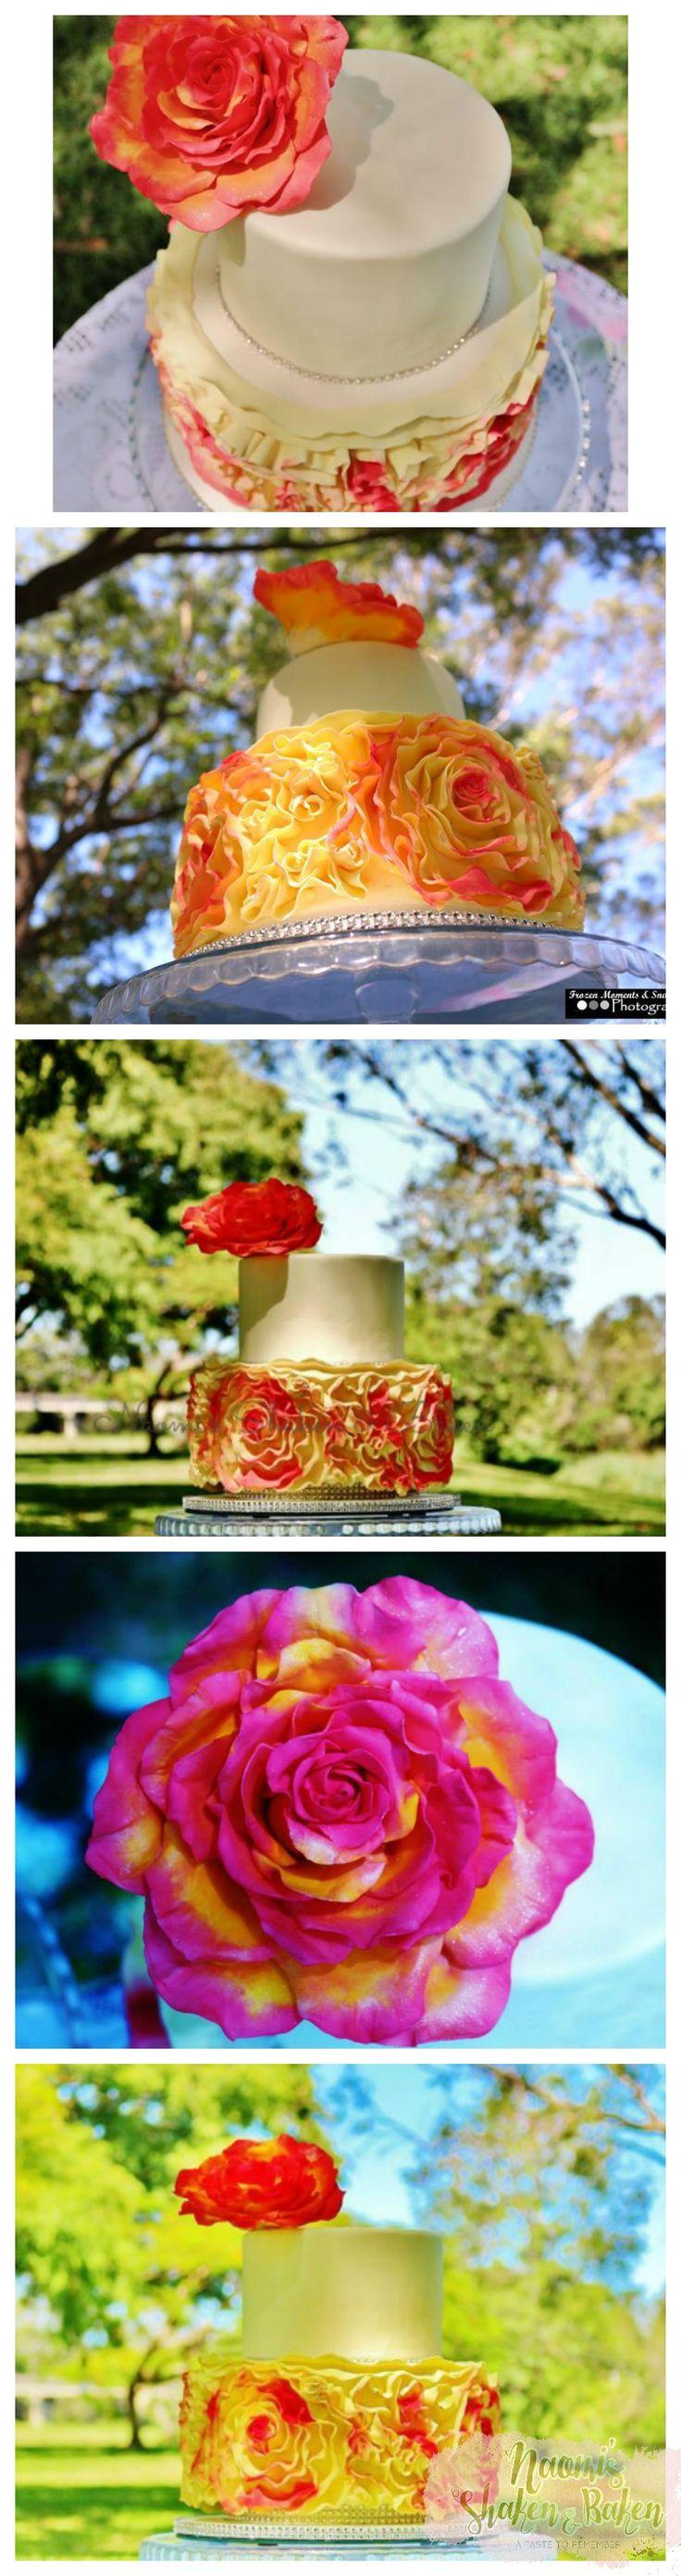 Wedding cake, wedding cupcakes, wedding, wedding planner, wedding event, gold coast, sunshine coast, Brisbane, hinterland weddings, romantic, rustic, vintage, simple, elegant, stunning, beautiful, love, breath taking, lovely, gorgeous, luxury, quality, cake, divine, mud cakes, vegan cakes, gluten free cakes, tantalizing, flowers. Edible art, edible toppers, edible flowers, Bride, groom, Caboolture, cake decorator, professional , ruffles, ruffle wedding cake, peach, yellow, white